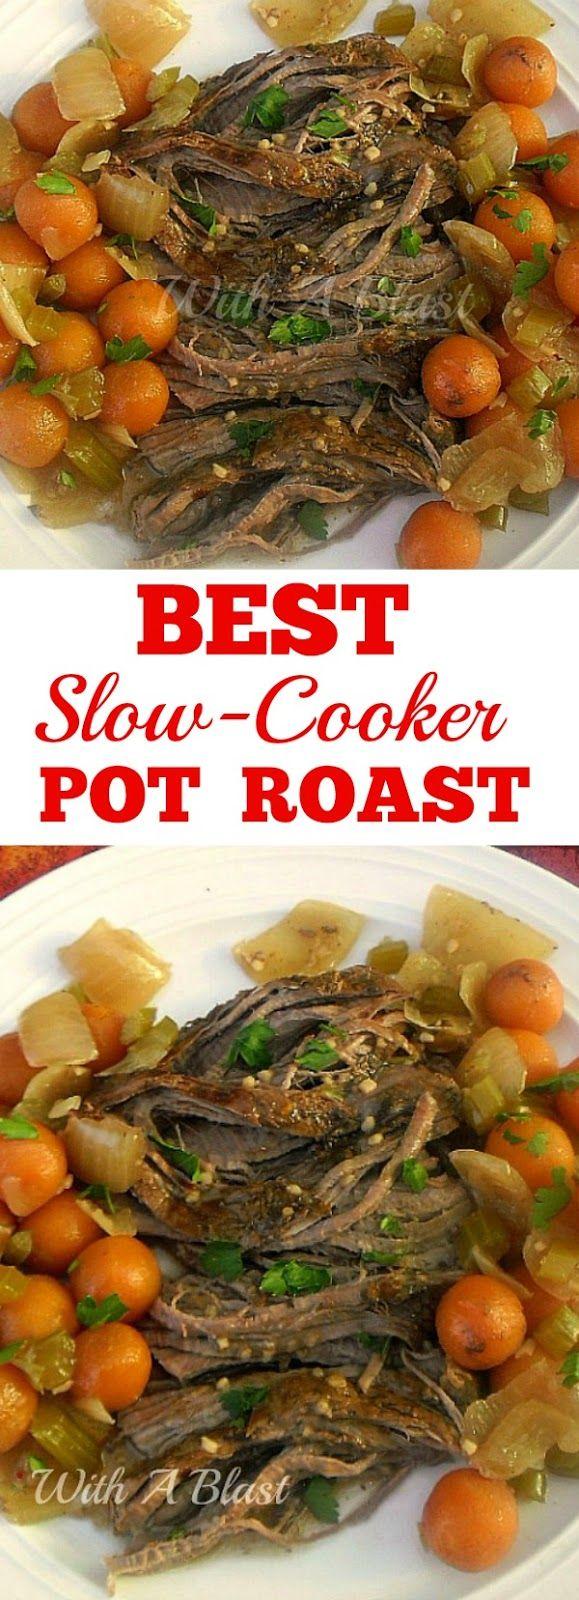 Best Slow-Cooker Pot Roast with Vegetables